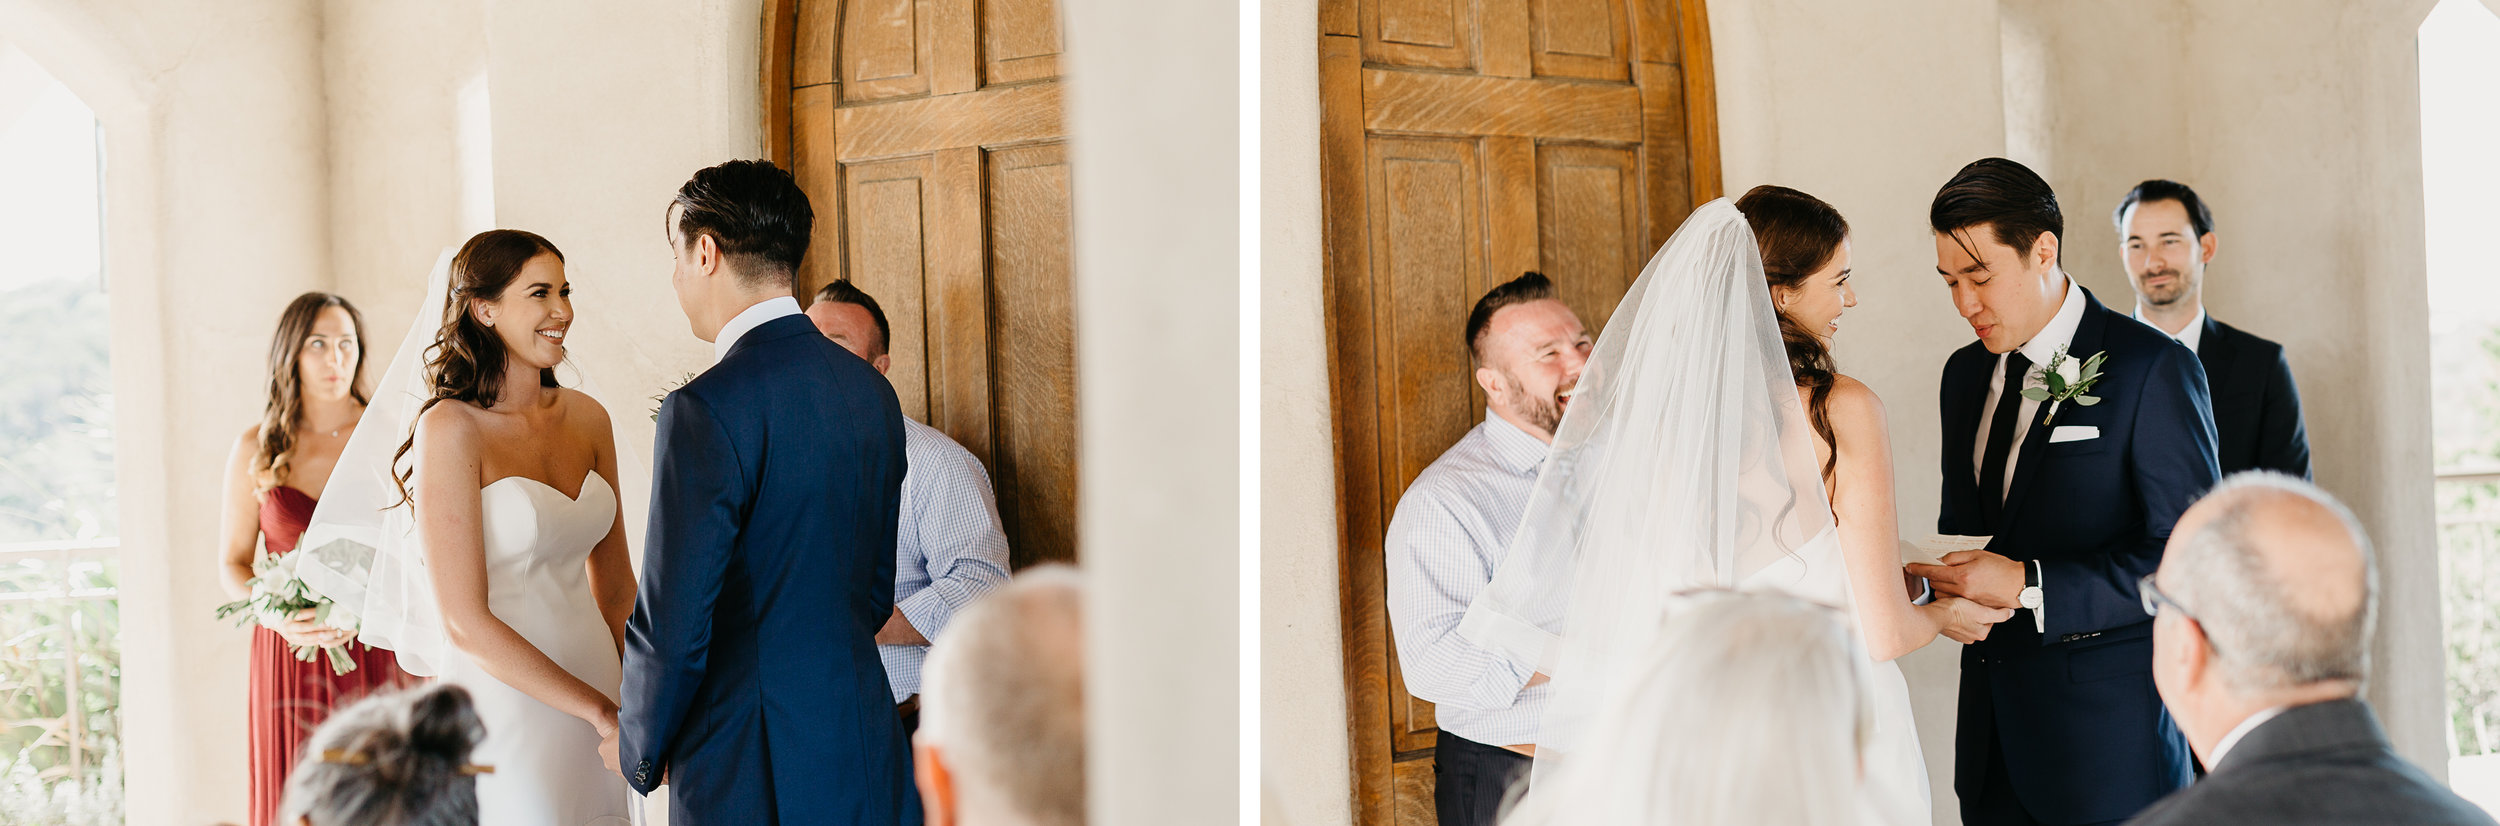 austin wedding photographer 5.jpg